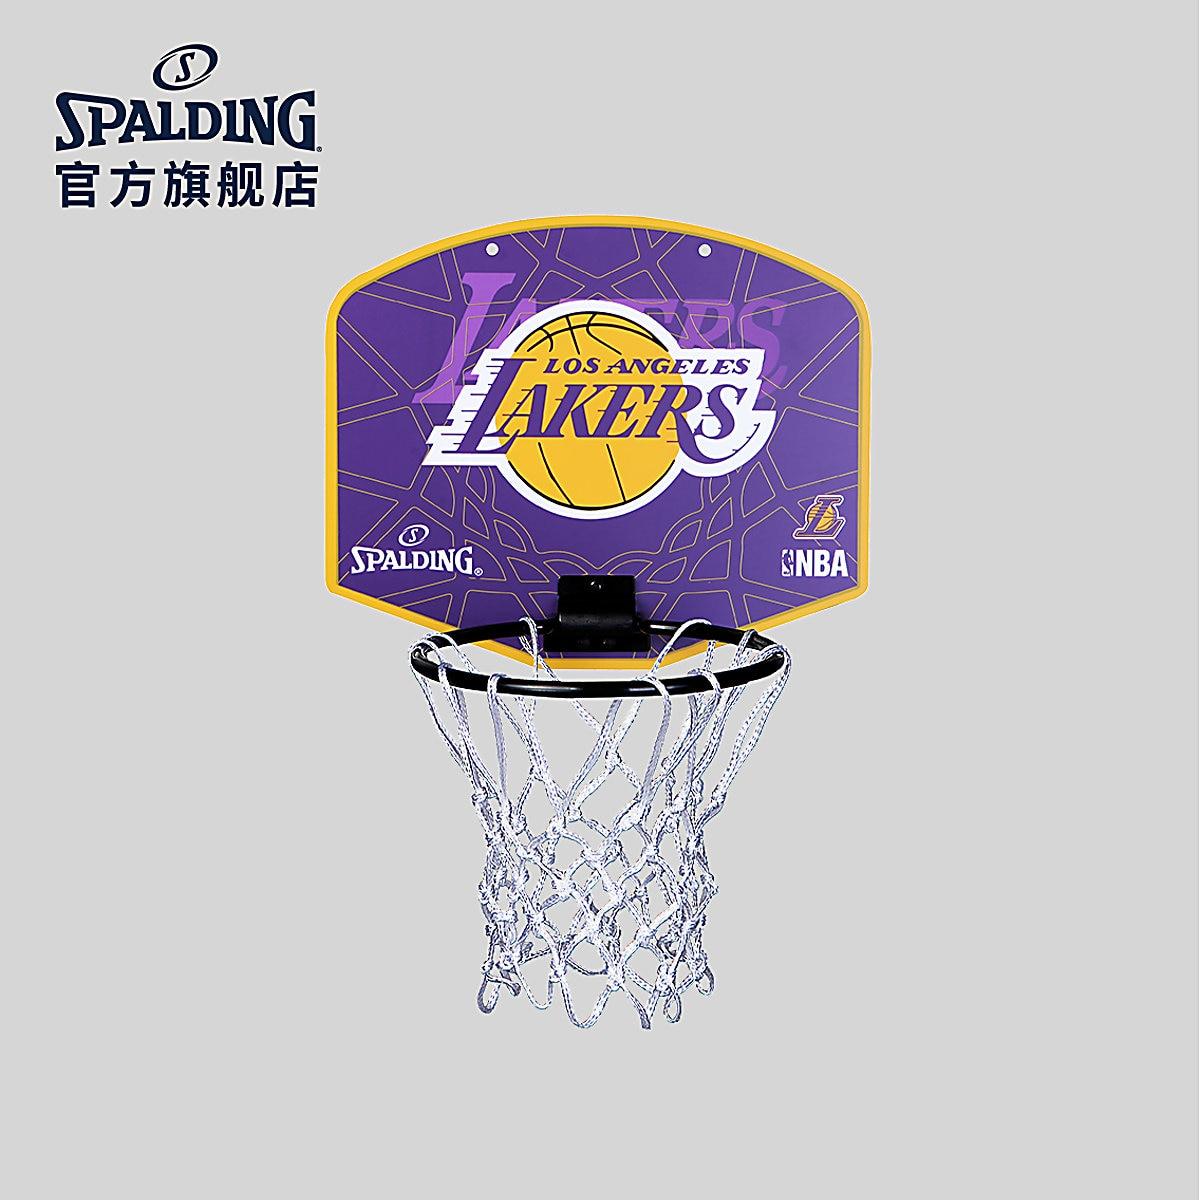 SPALDING Children's Sports Hanging Basketball Board Mini Backboard Children's Indoor Basketball Training